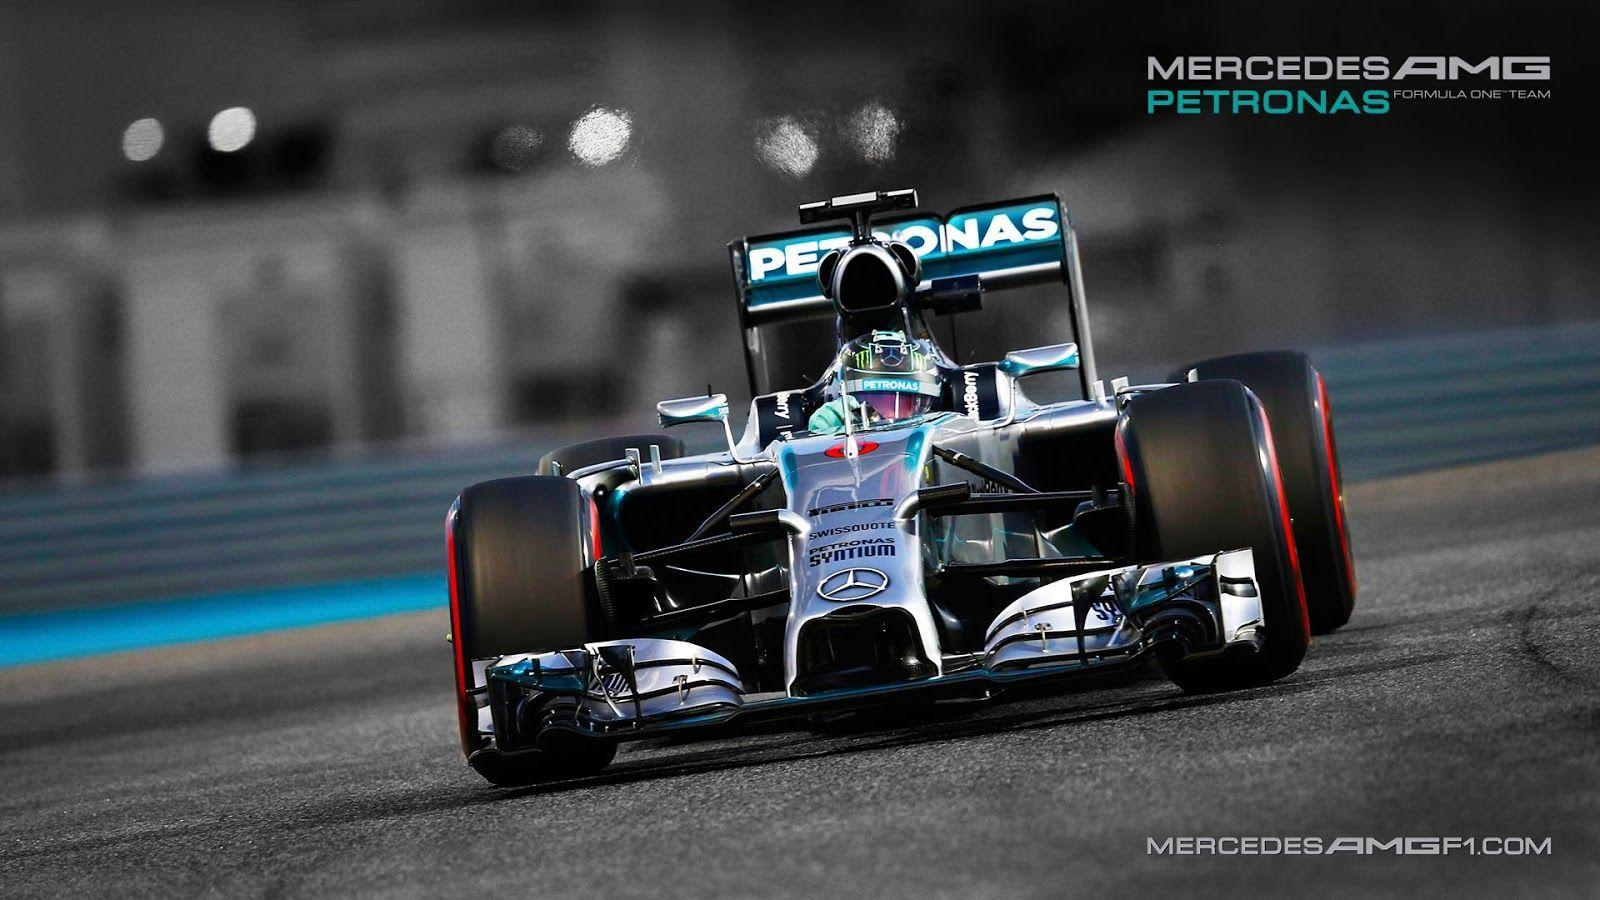 Mercedes-Benz Petronas Teams Background